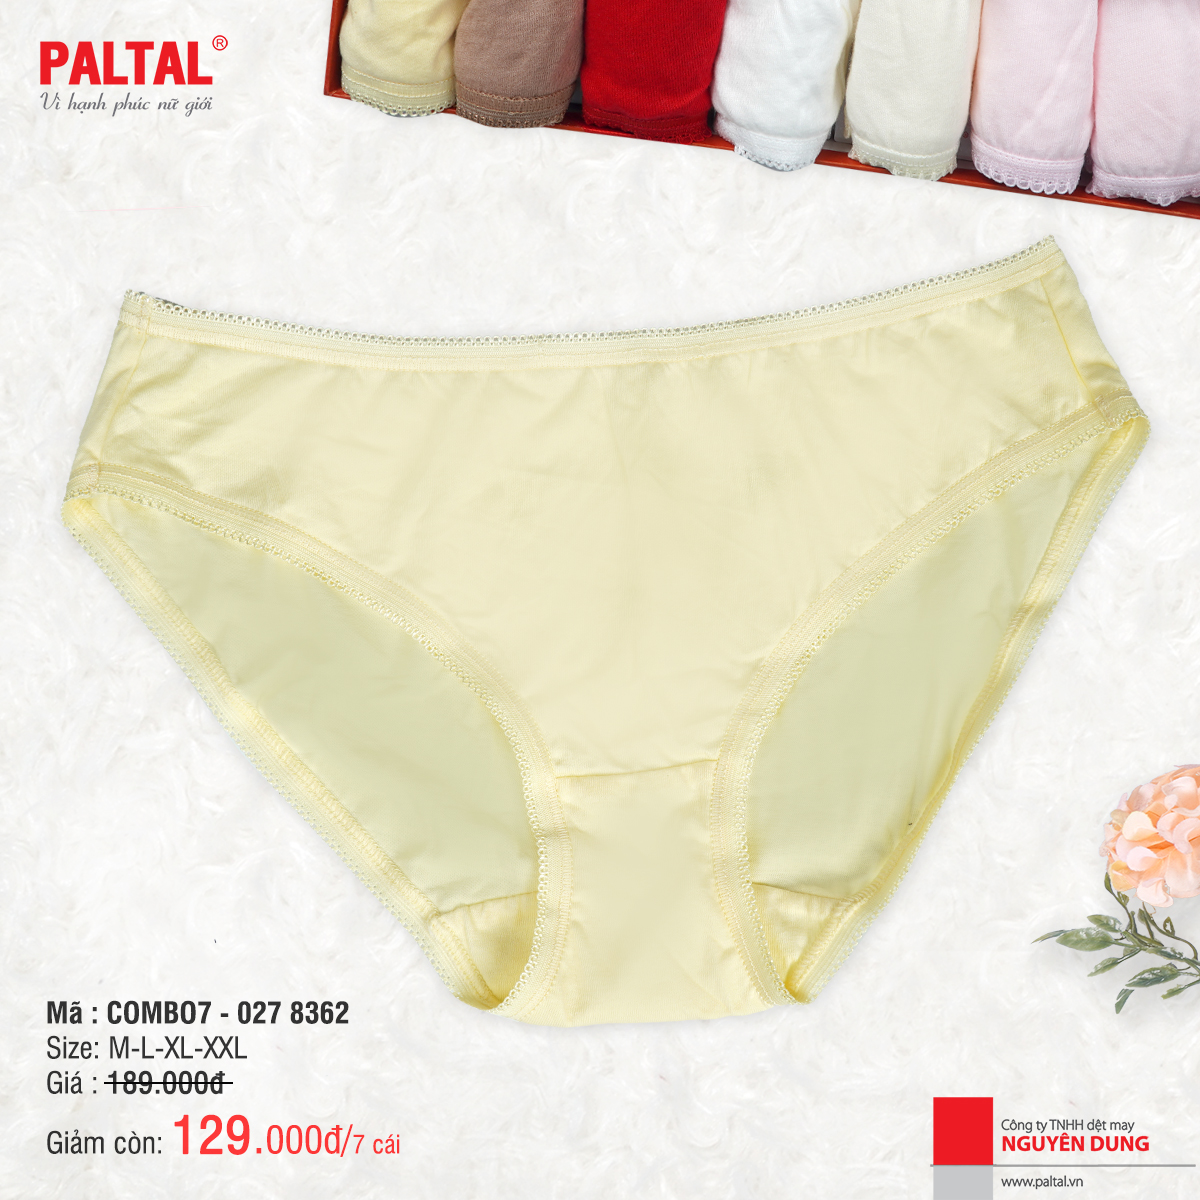 Combo 7 quần lót cao cấp paltal ql 027p 8362